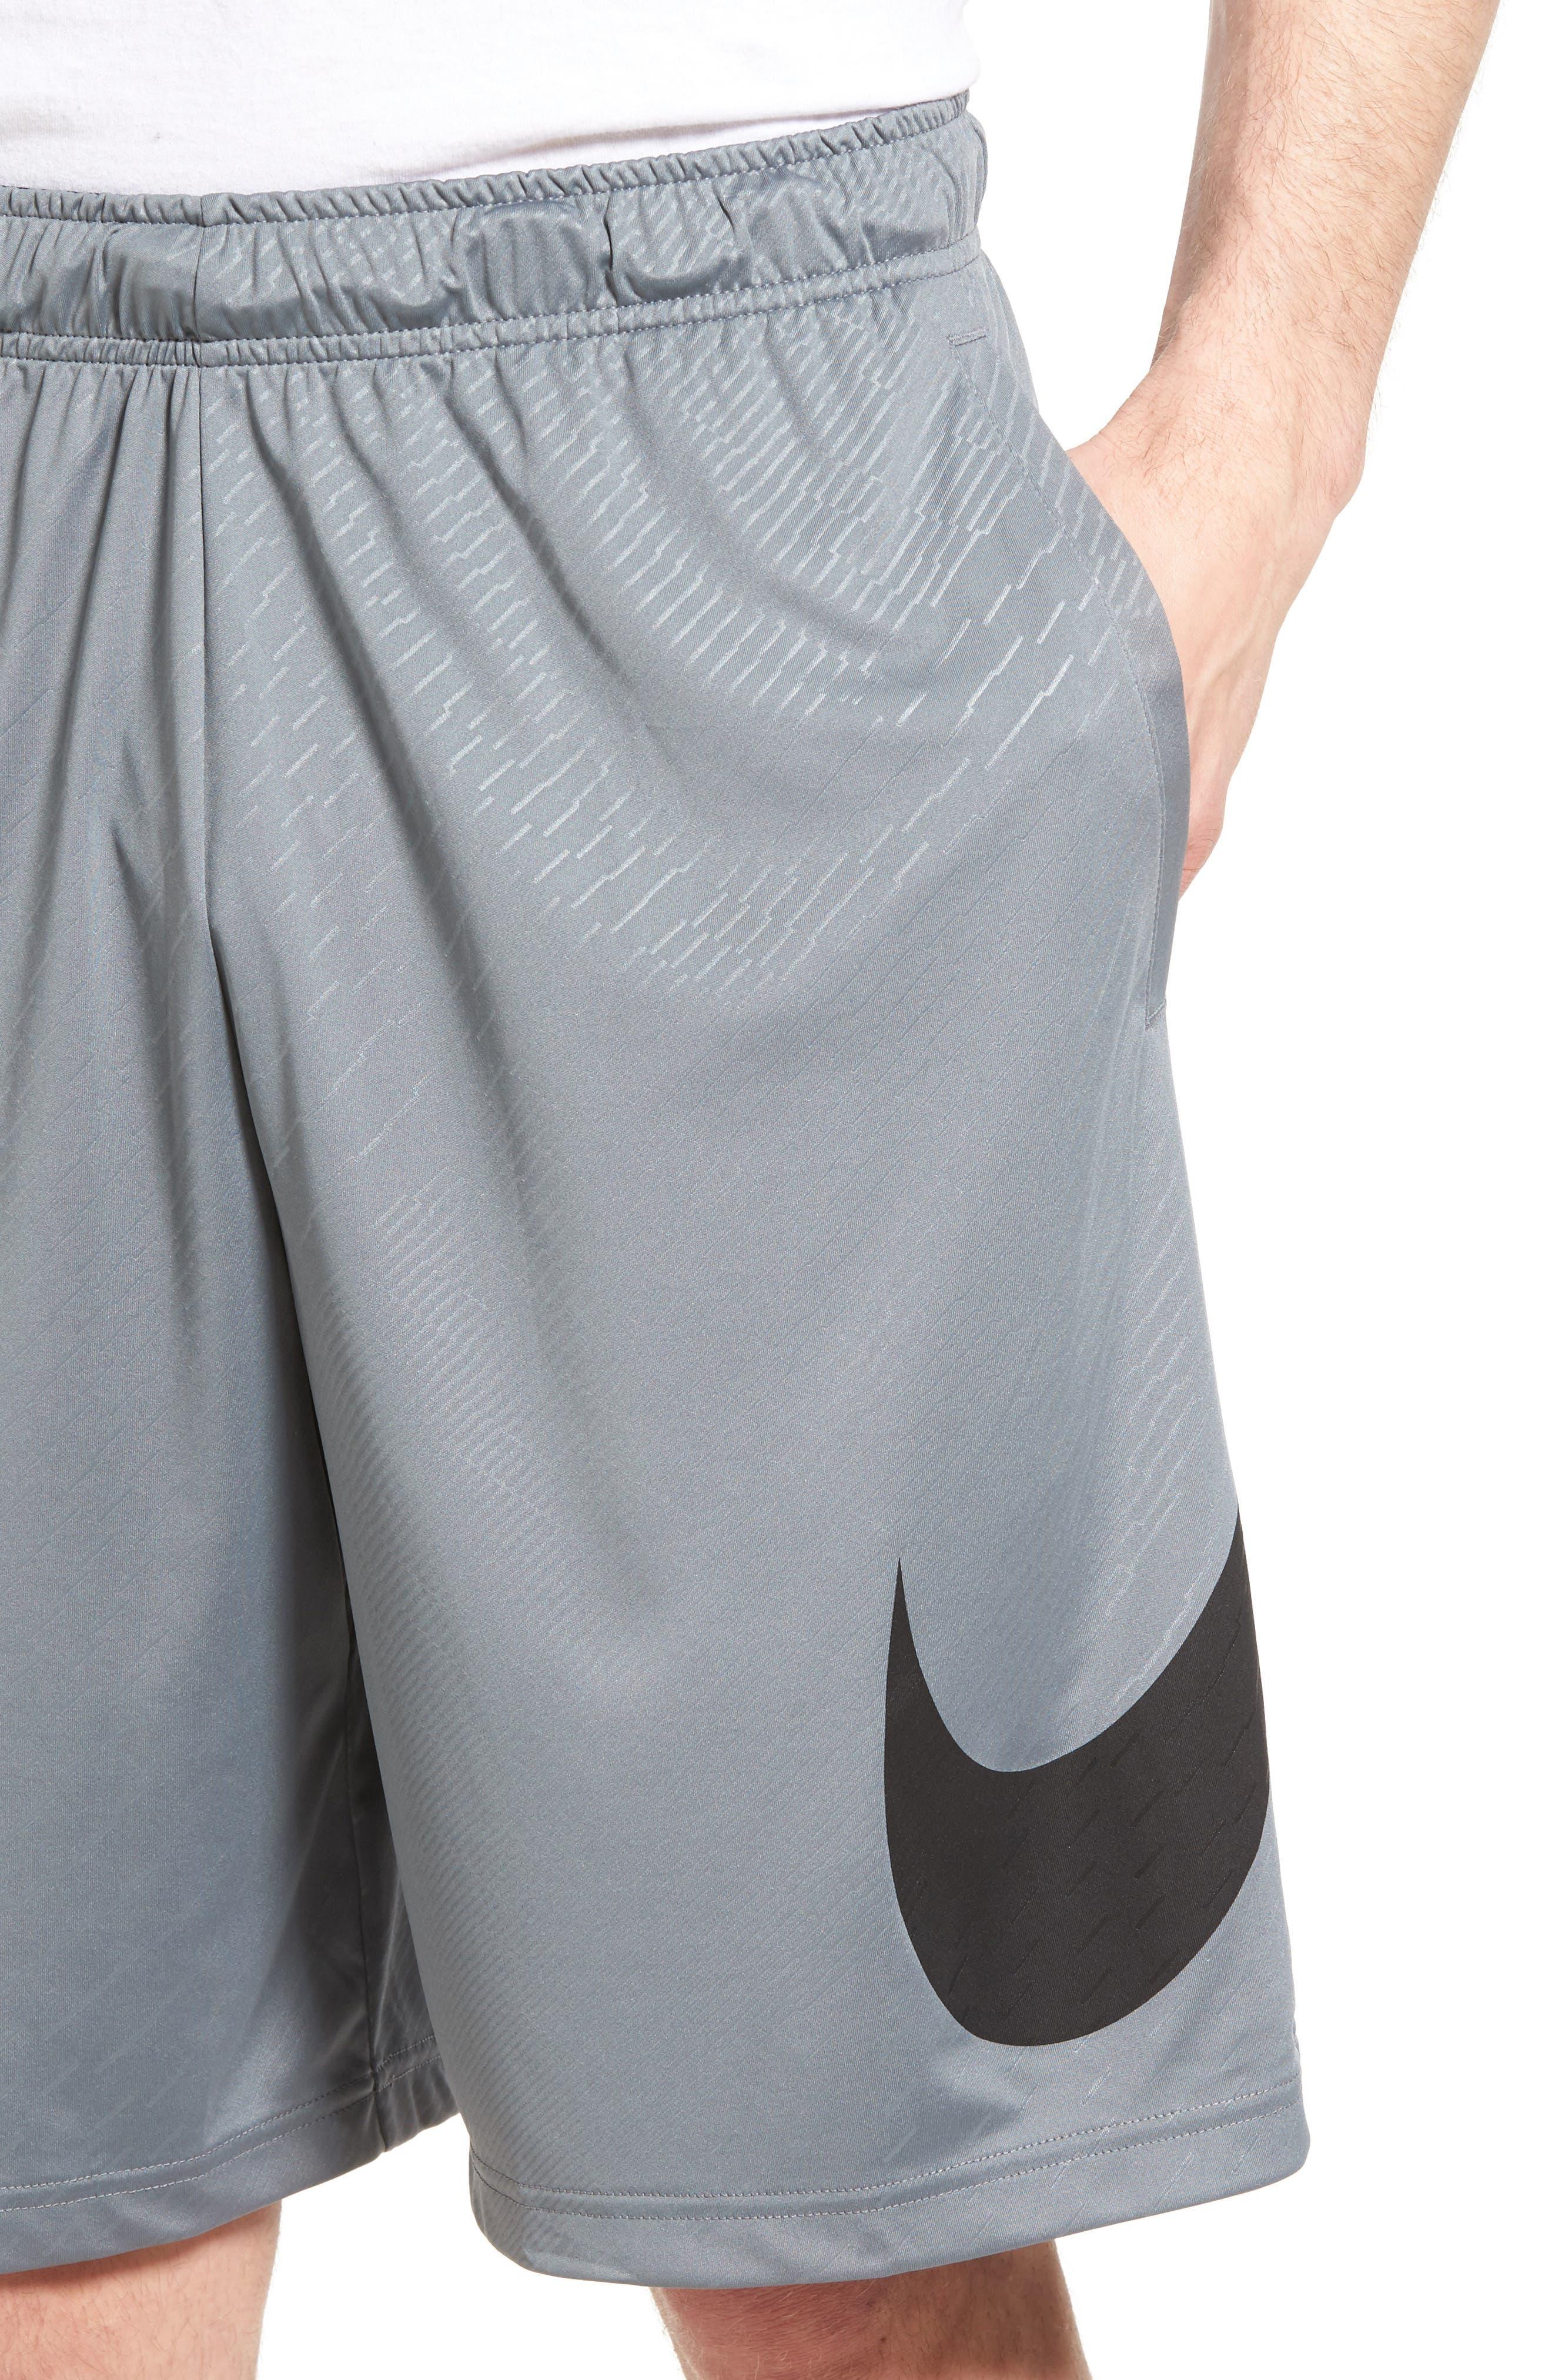 Dry Training Shorts,                             Alternate thumbnail 8, color,